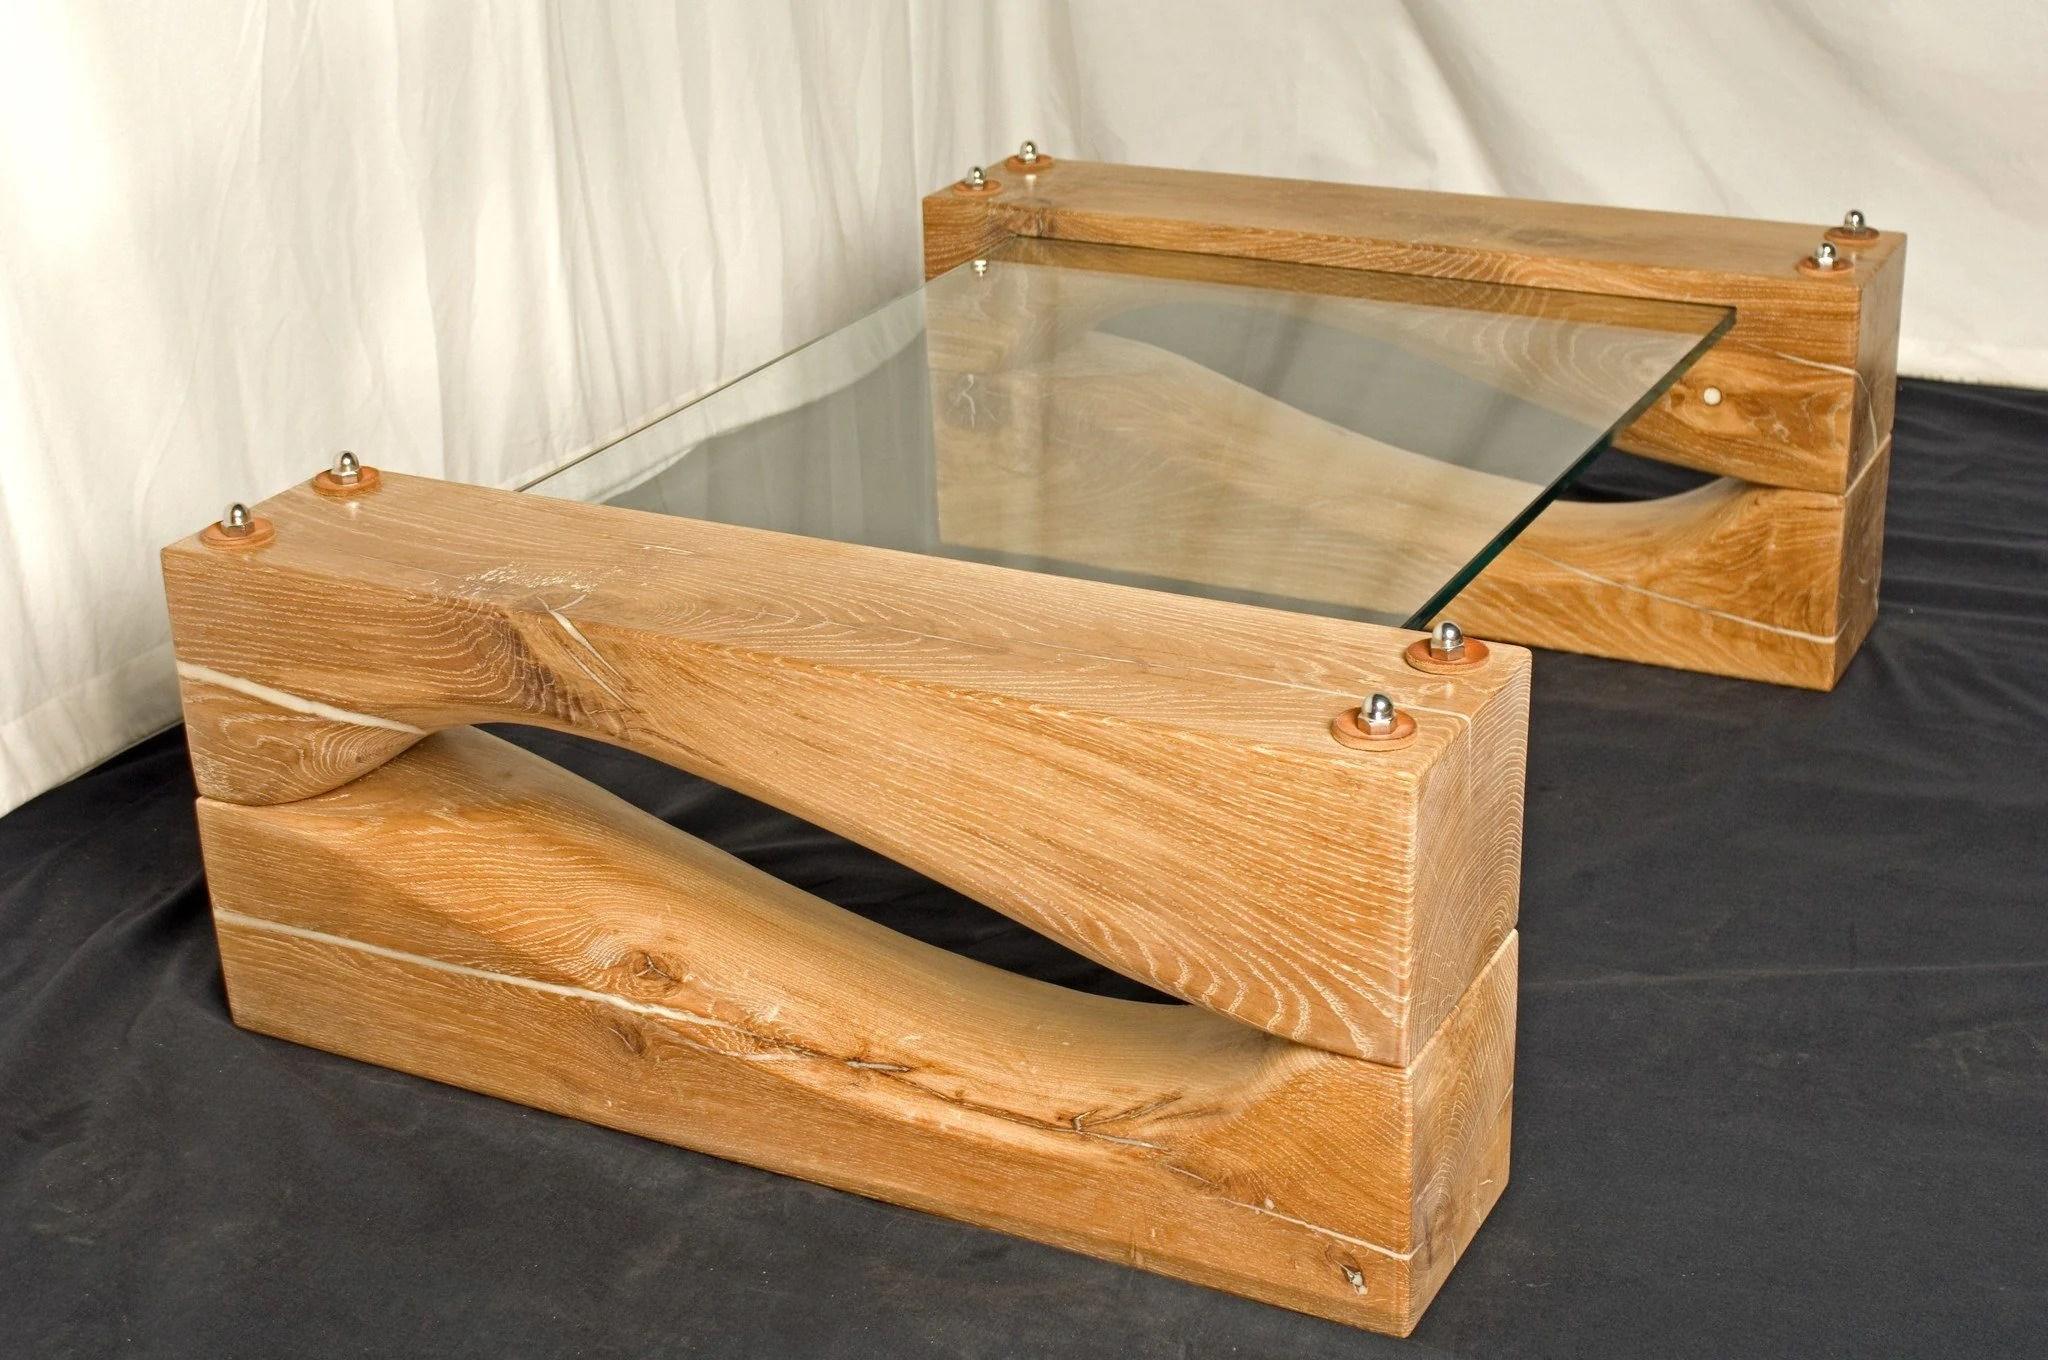 sea shapes oak glass coffee table